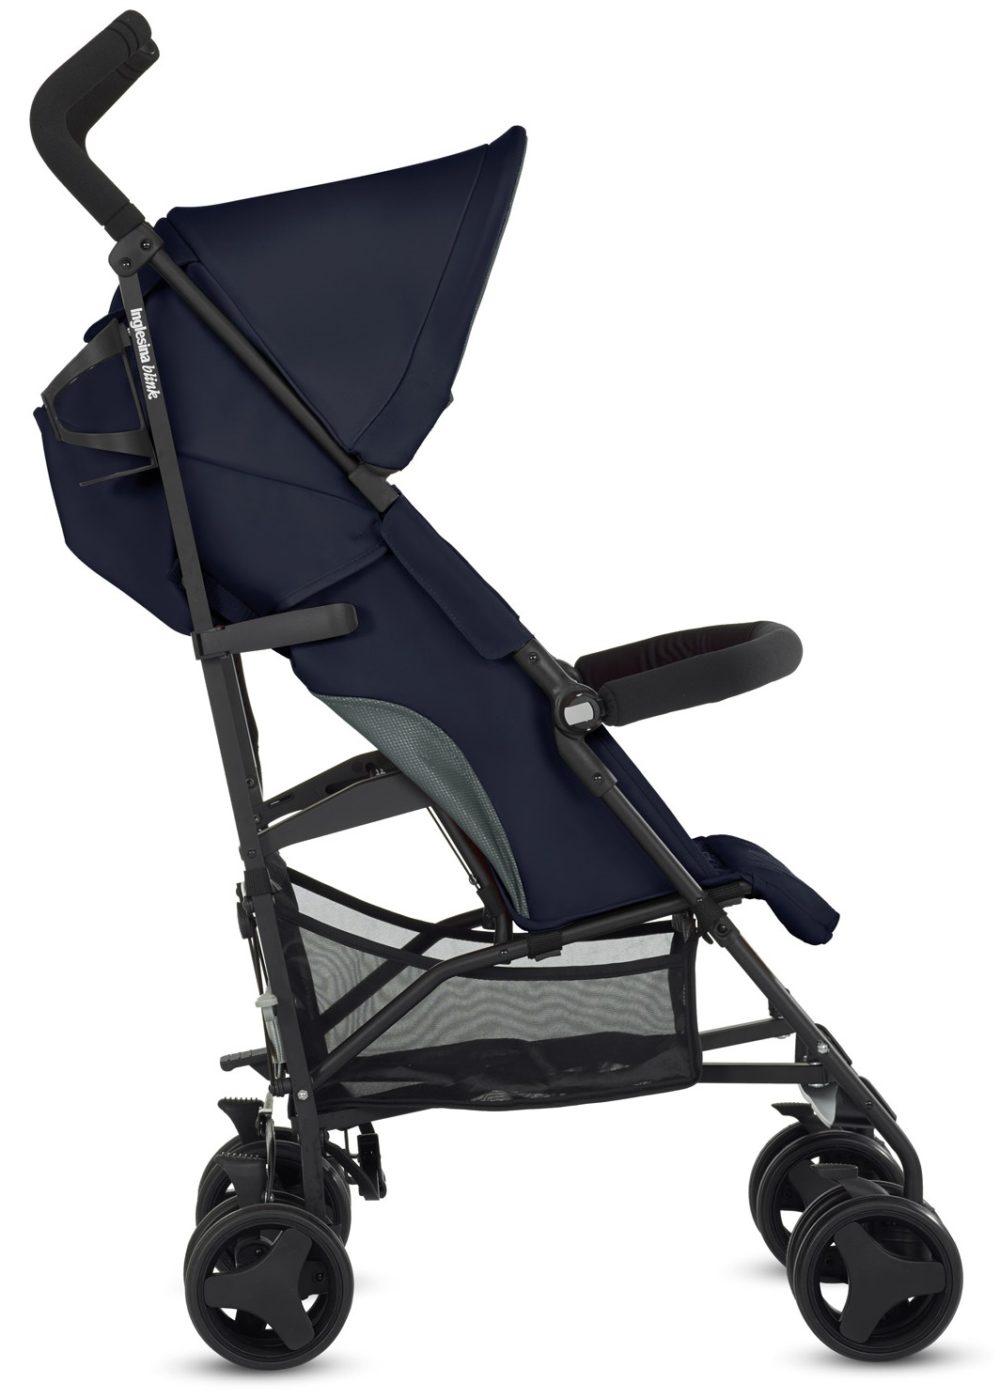 Детская коляска Inglesina Blink (темно-синий)